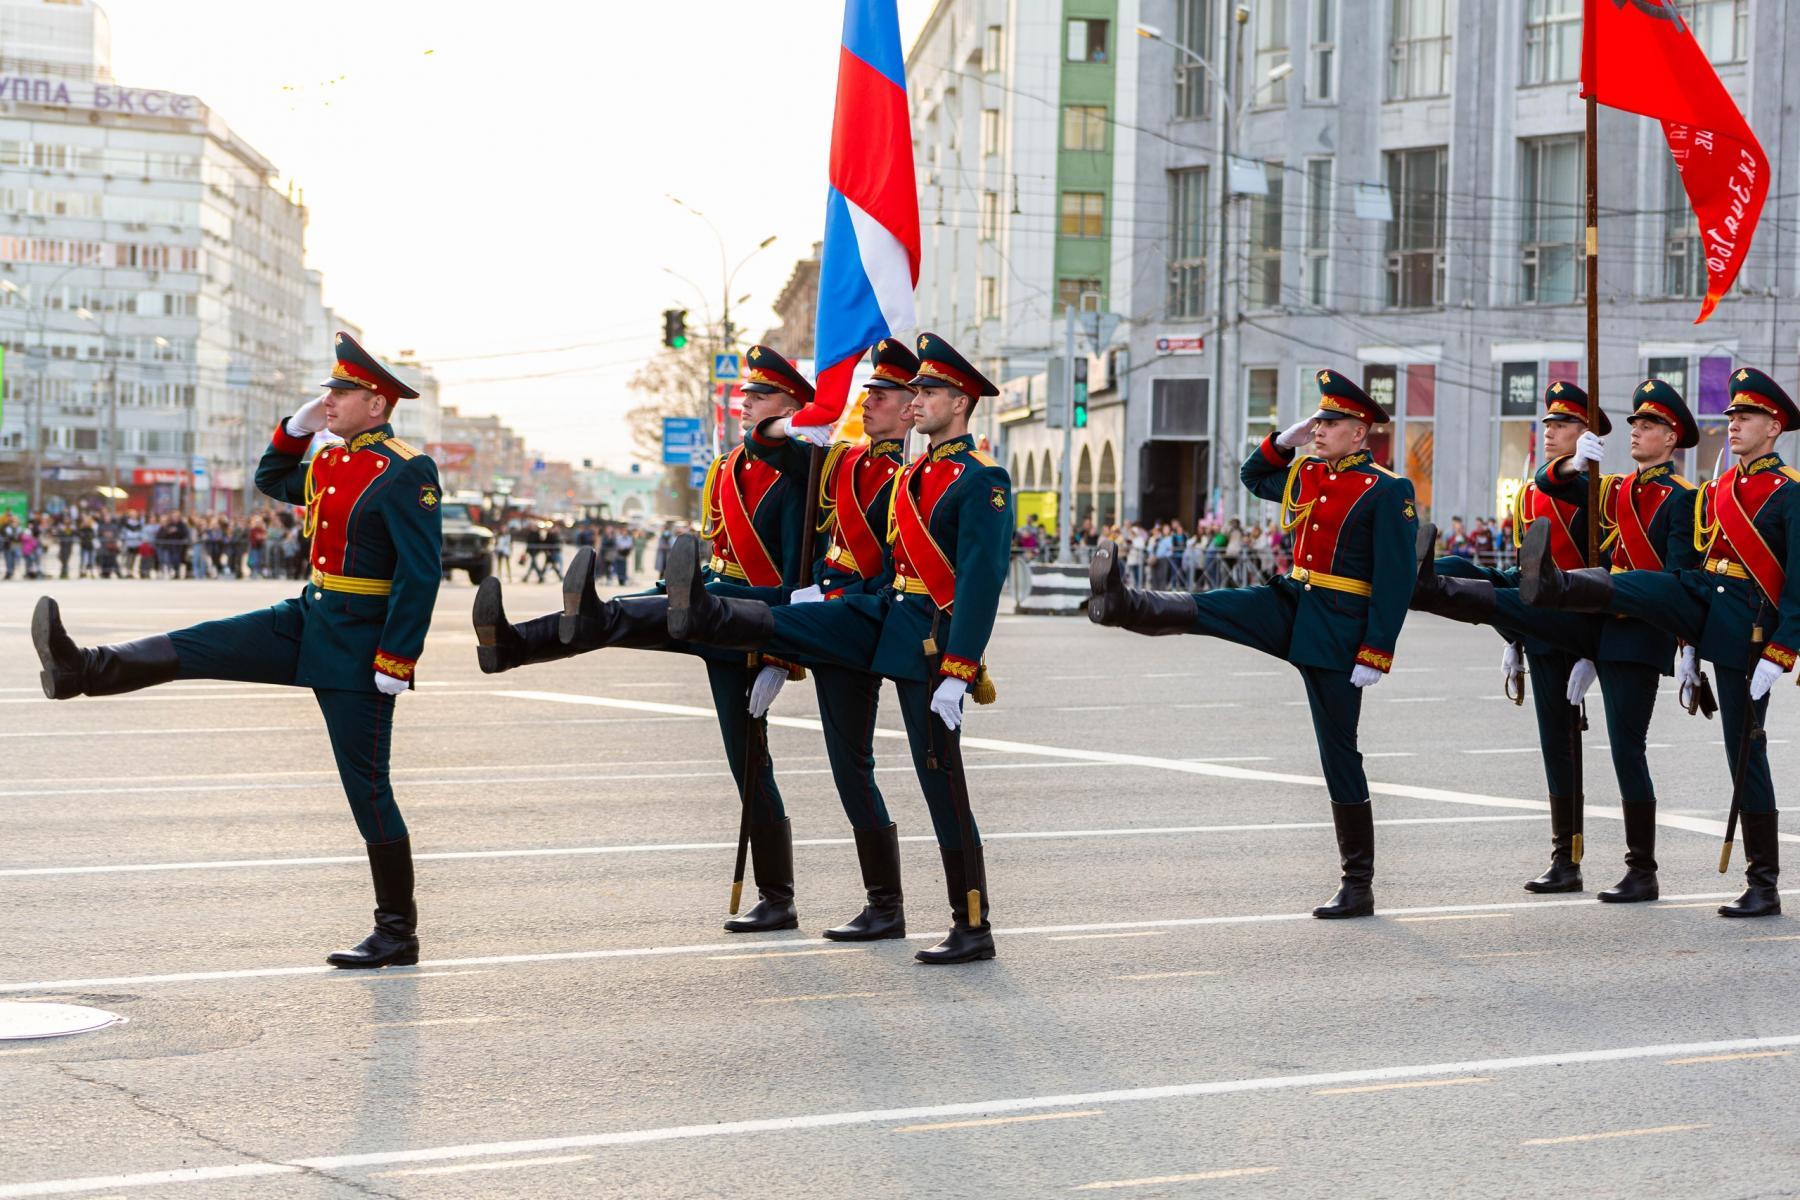 Фото Флаги, форма, техника, толпы зрителей: лучшие фото с репетиции парада в Новосибирске 6